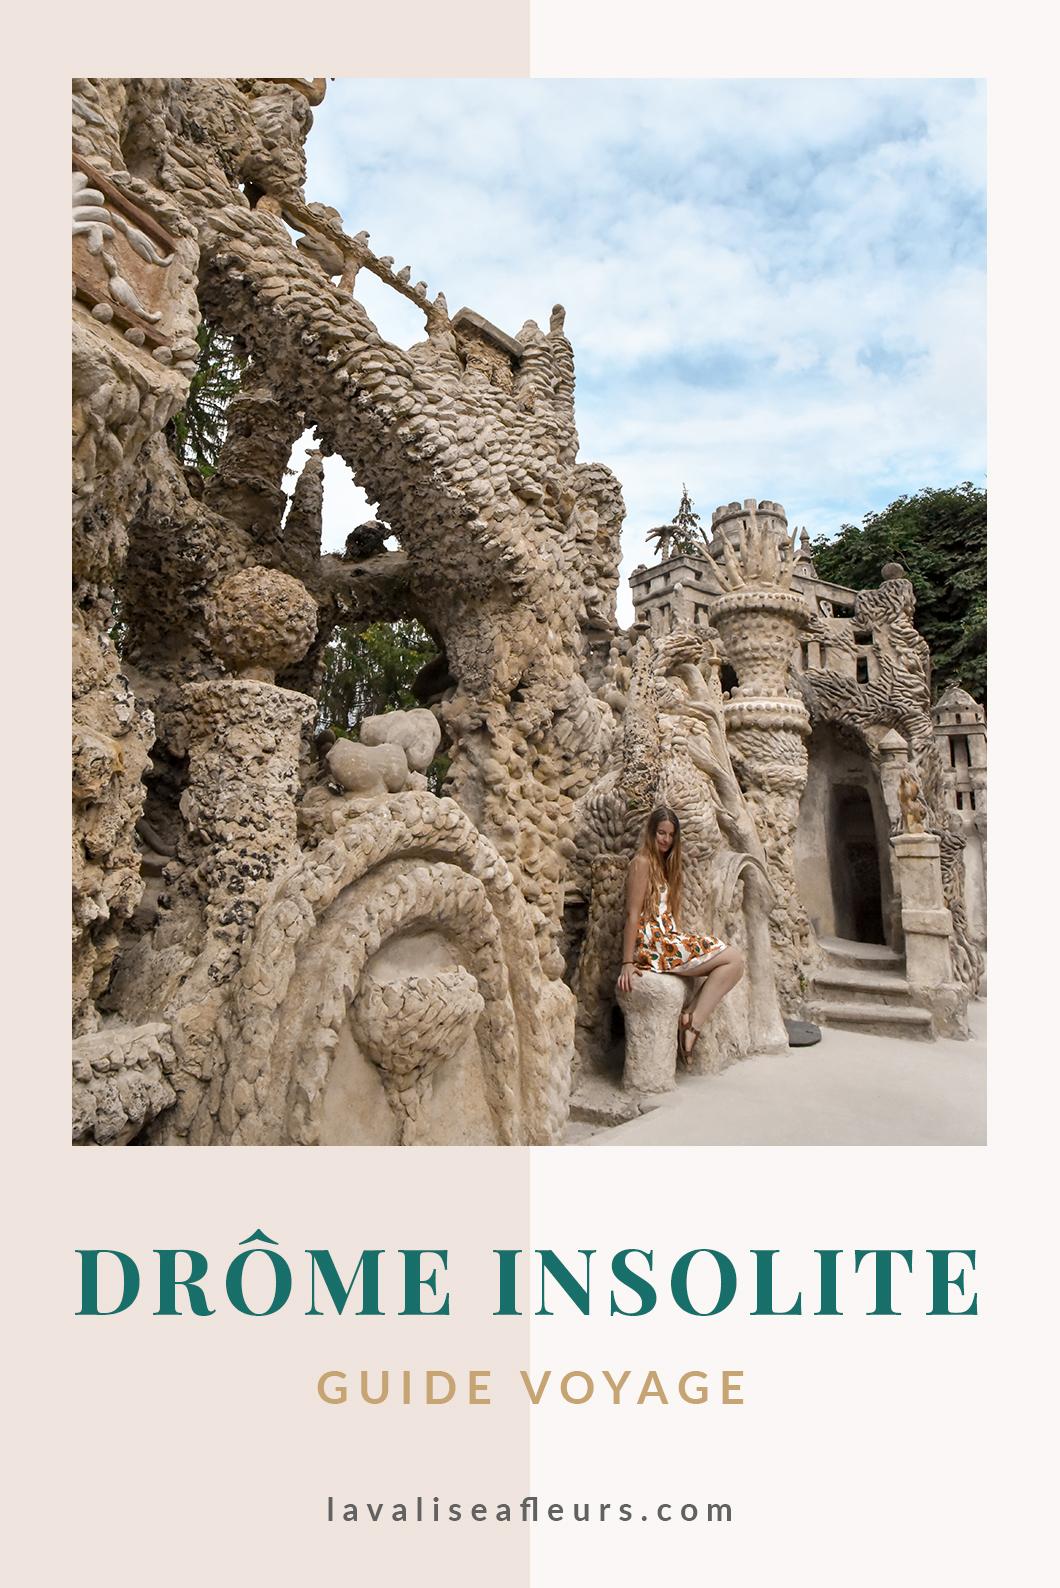 Guide voyage de la Drôme insolite